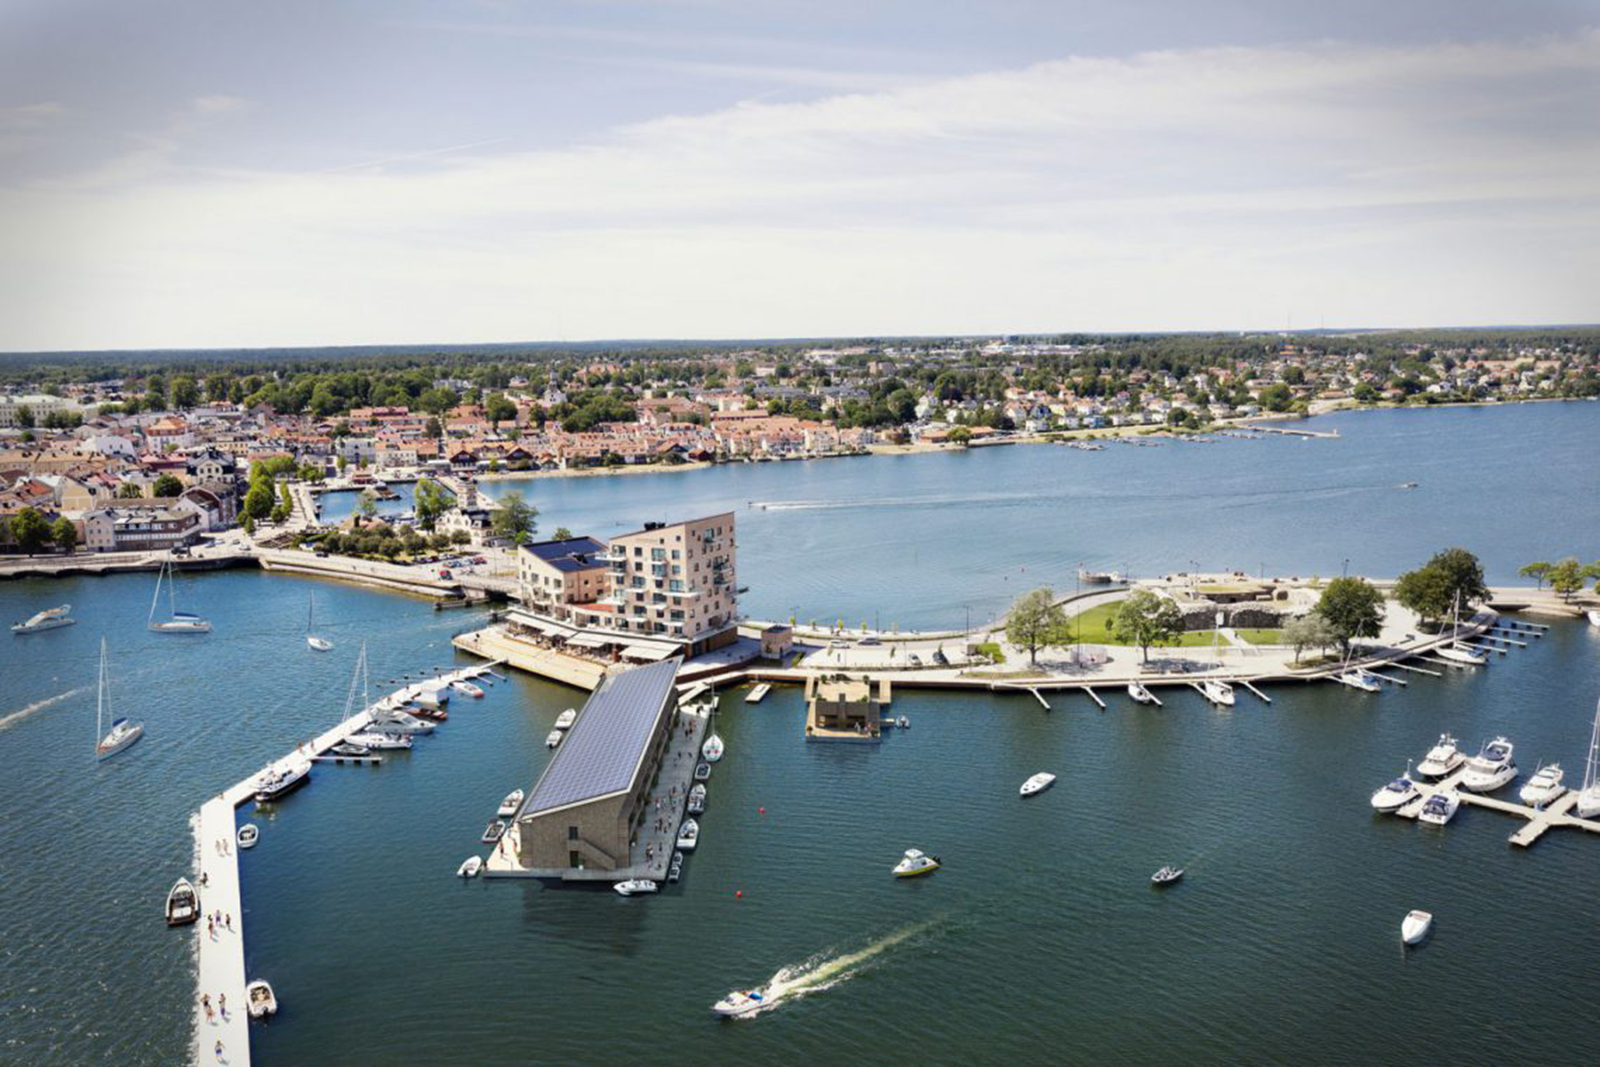 Västervik-Slottskomens marina